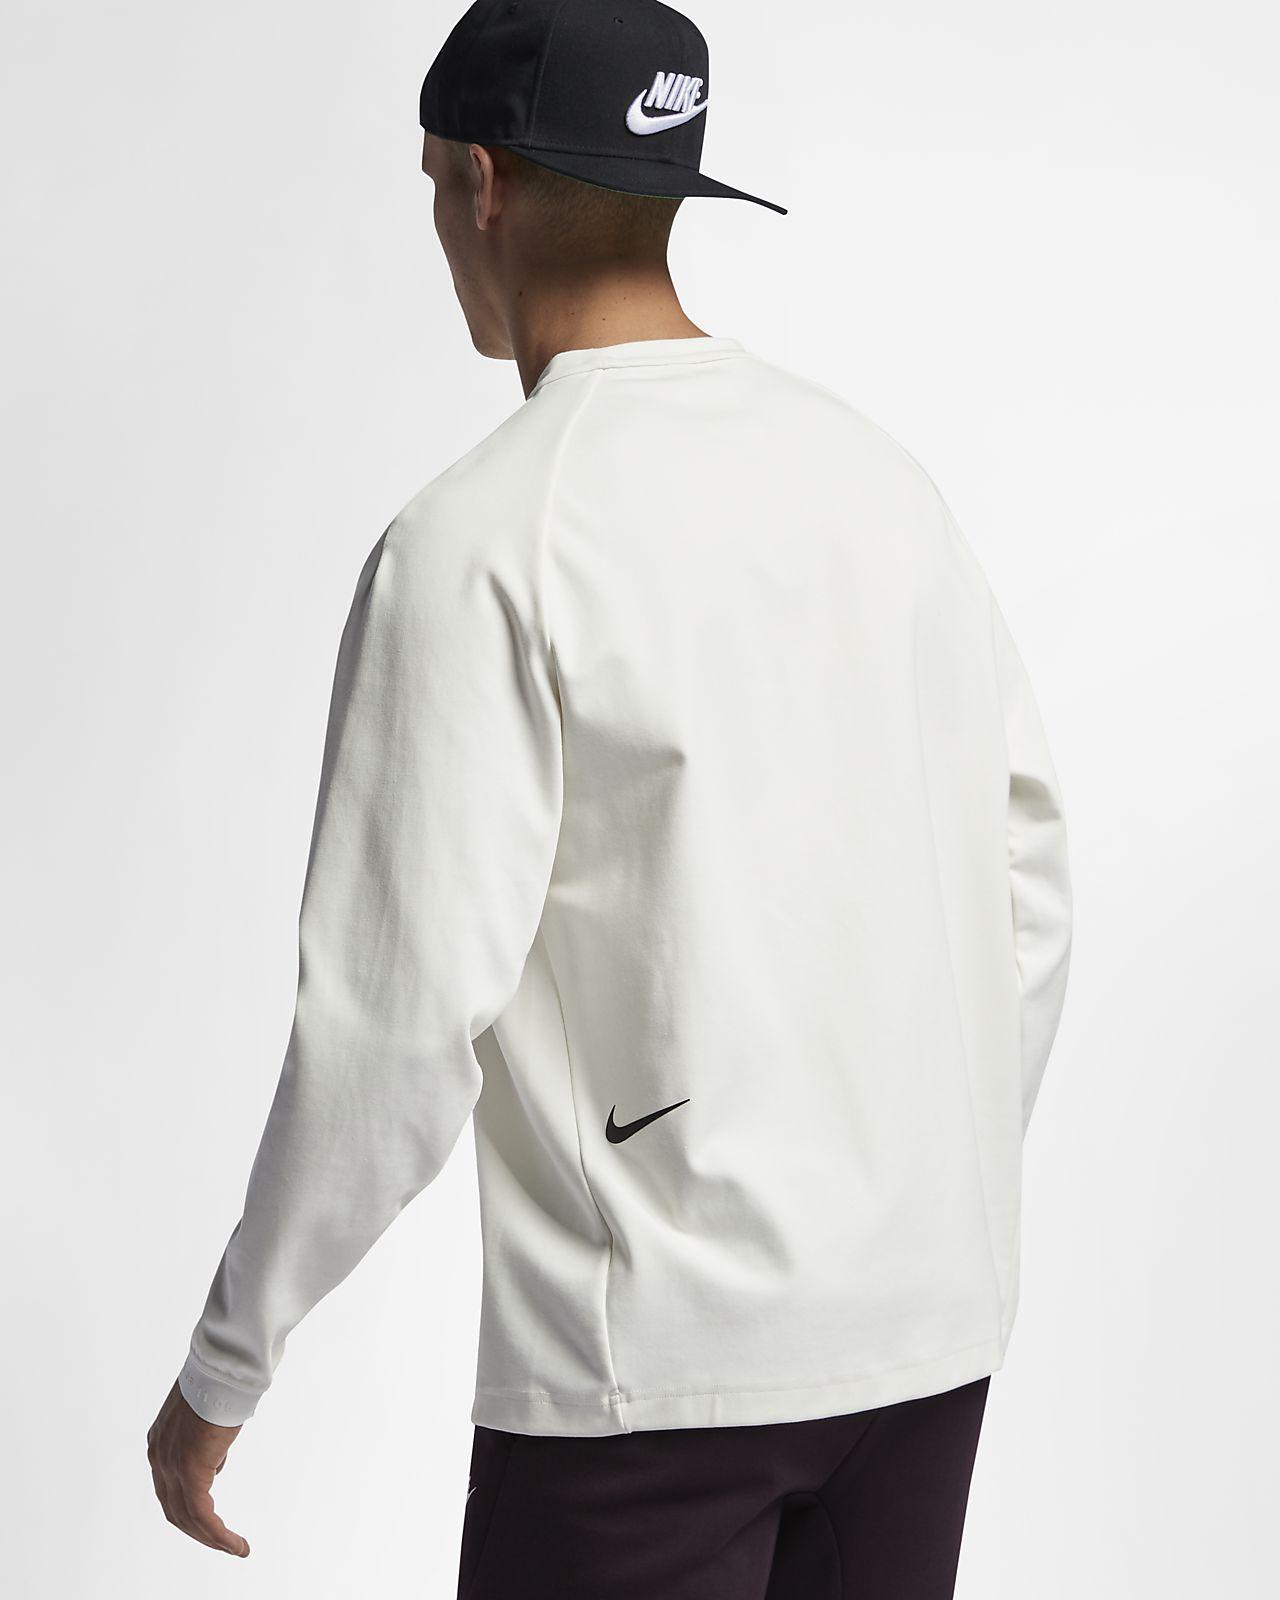 diseño atemporal d21ba 8b6aa Sudadera tejida para hombre Nike Sportswear Tech Pack